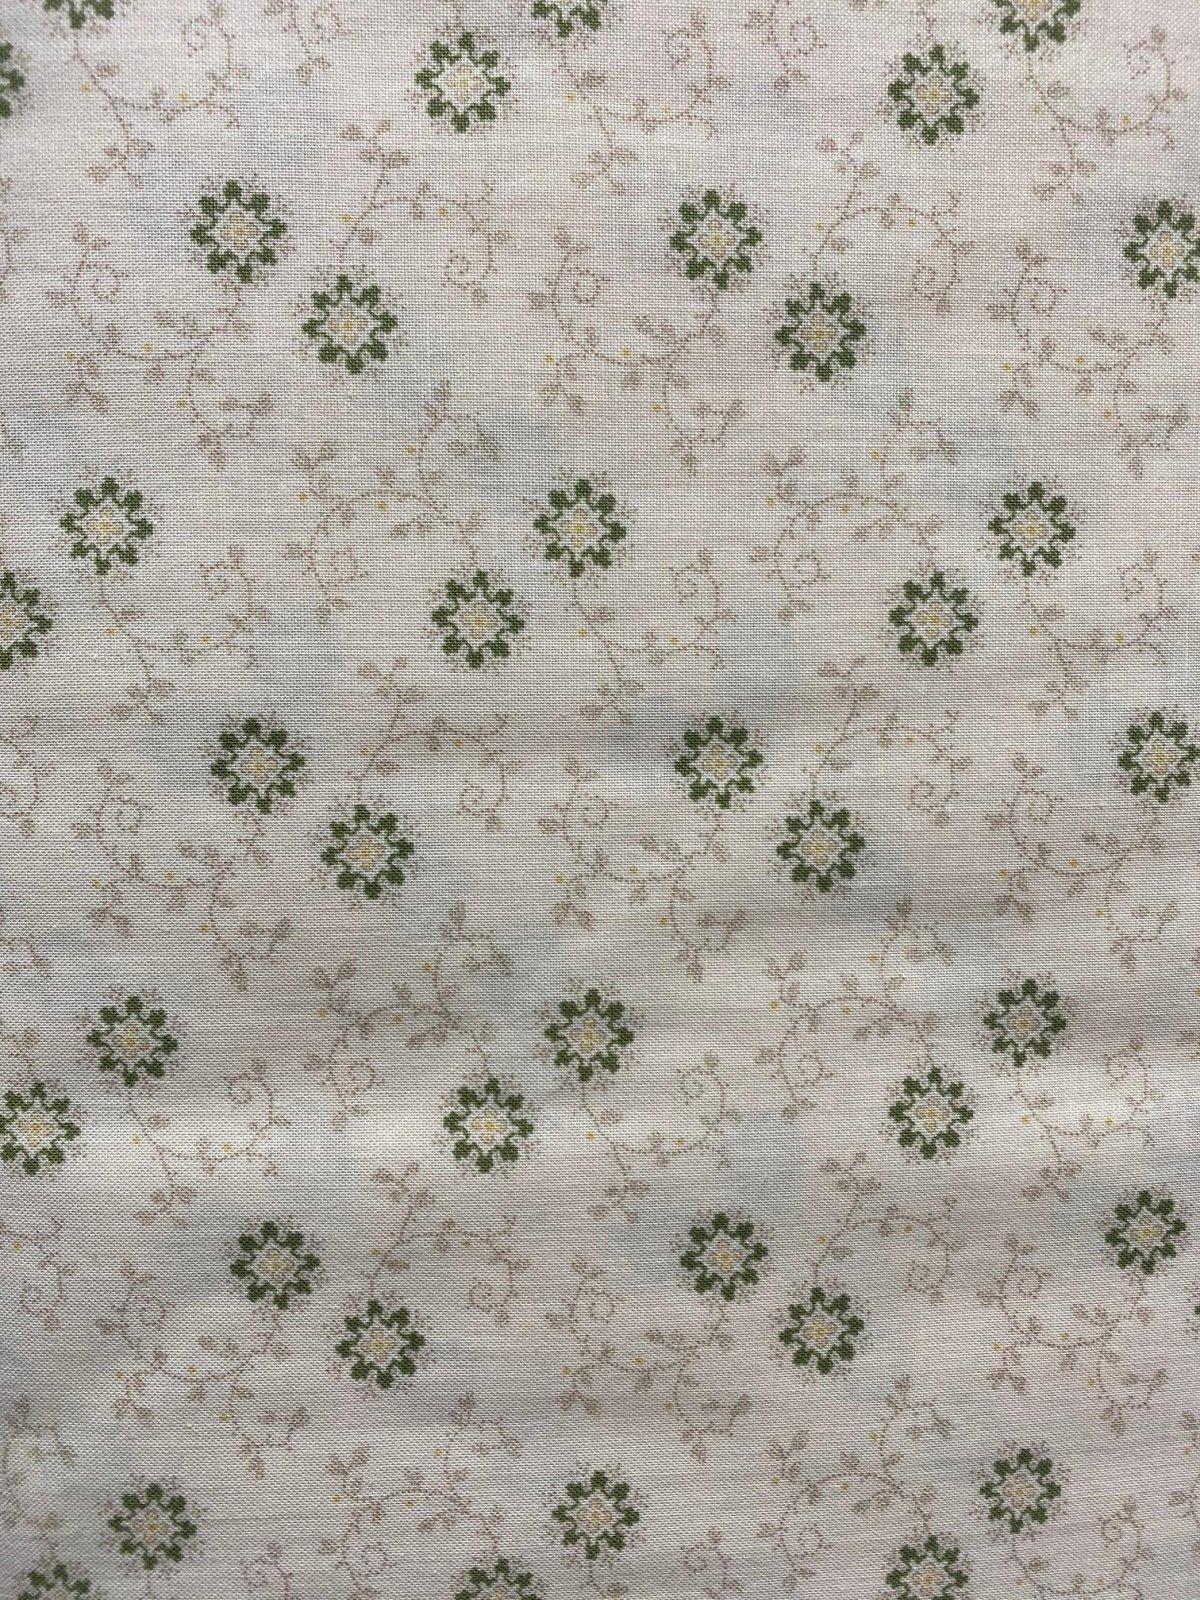 American Textile 5660 beige print